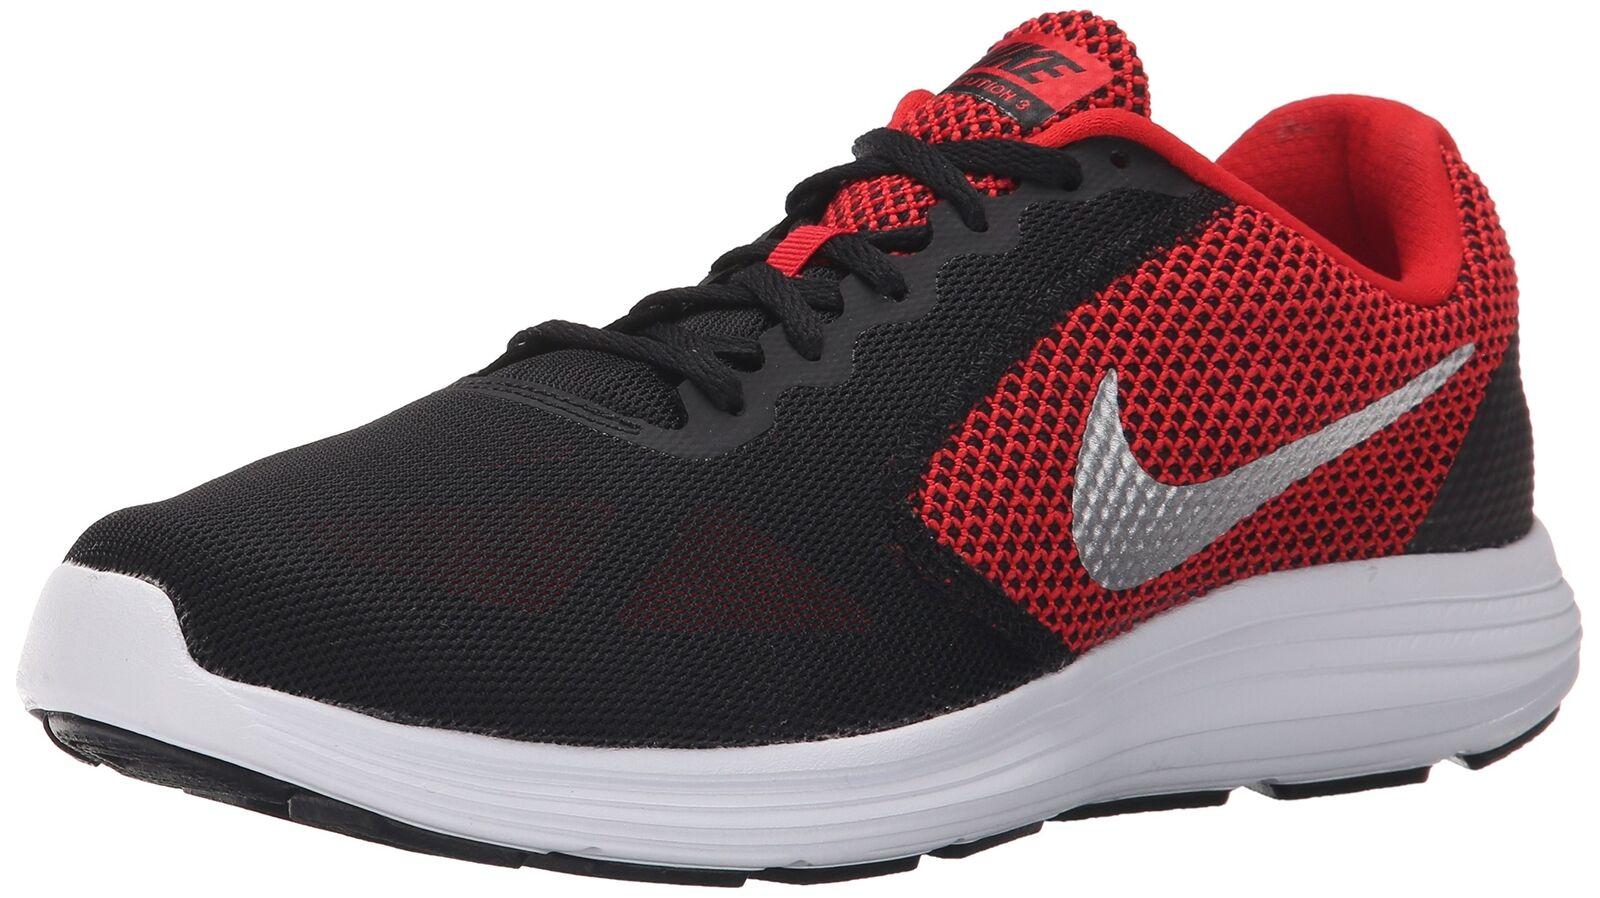 Nike hombre Revolution 3 running zapatos Universidad Rojo / / negro / blanco / Rojo plata metalizado bf5fe3